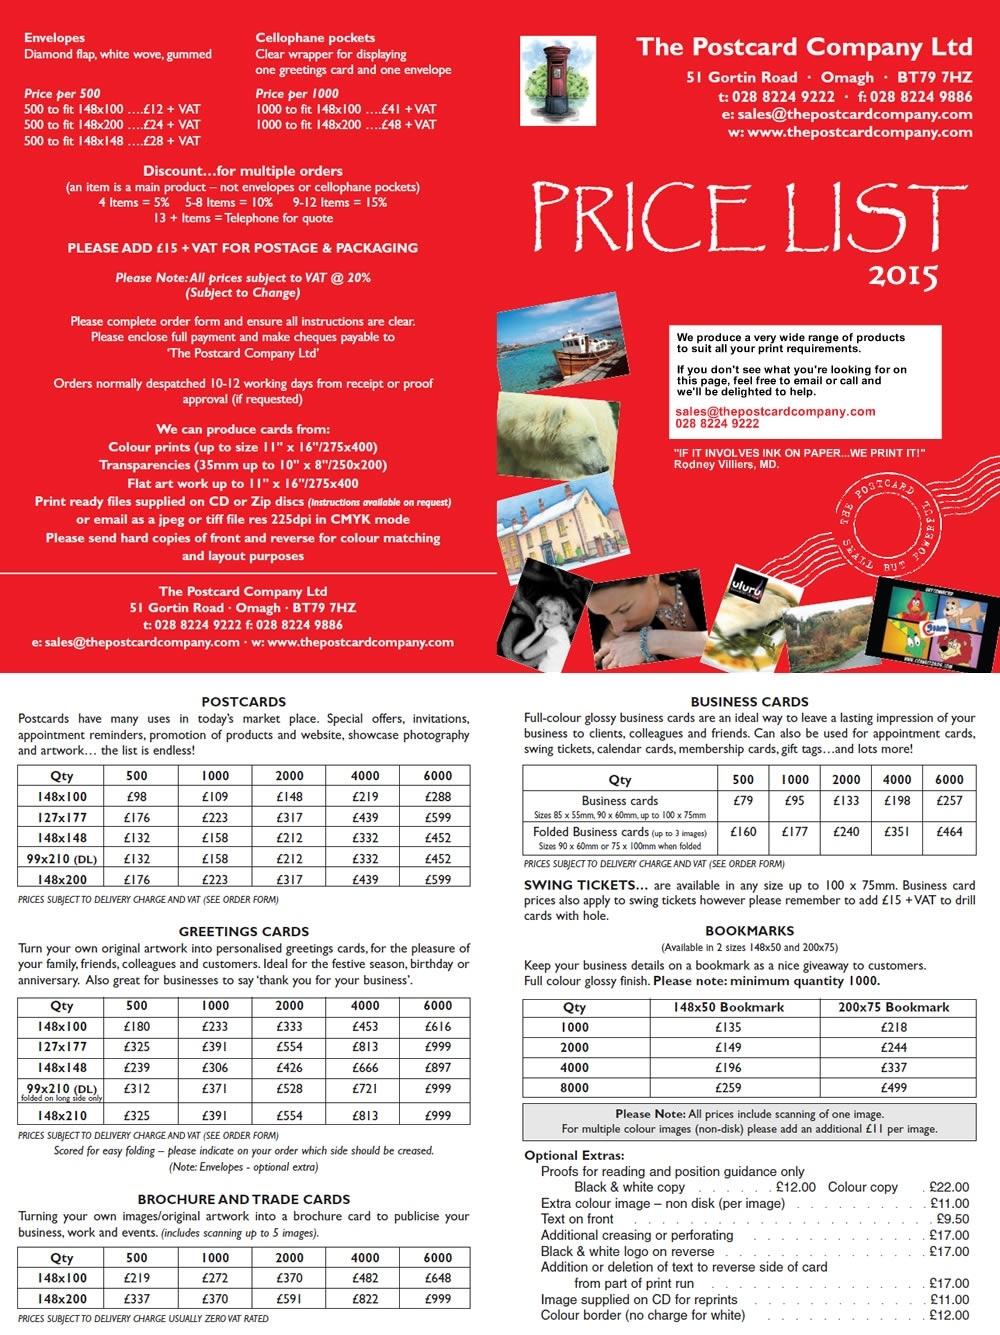 Postcard Printing By The Postcard Company Calendar Printing Price List